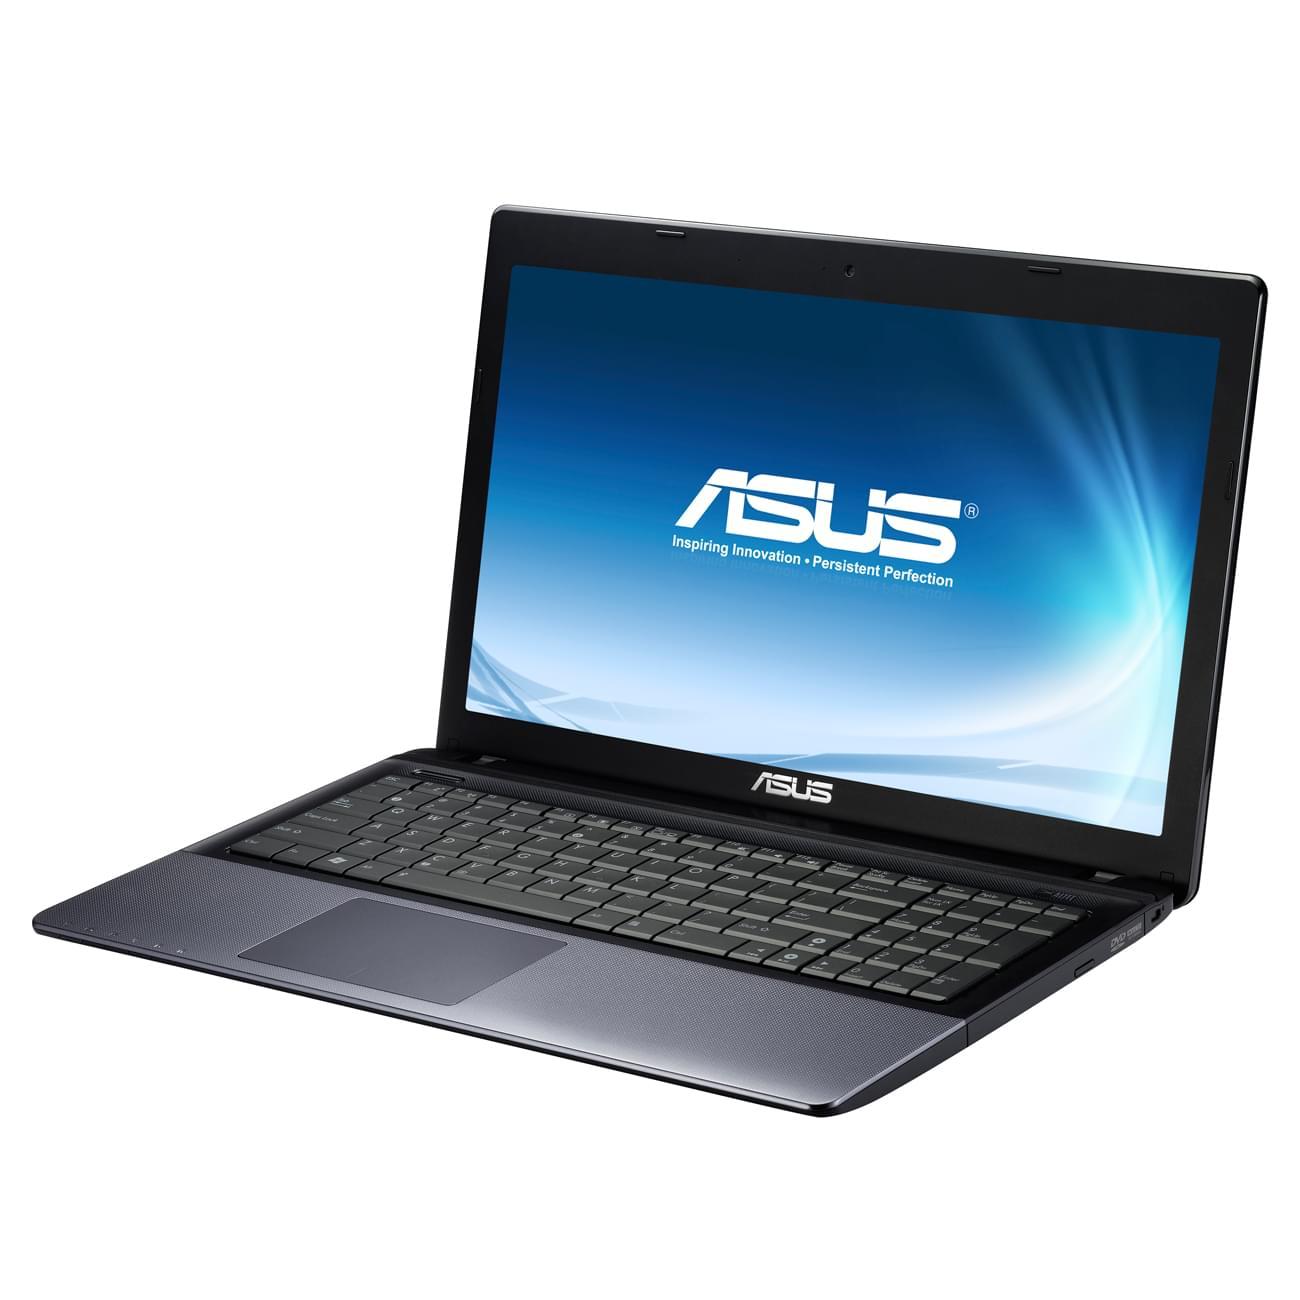 Asus X55VD-SX080H - PC portable Asus - Cybertek.fr - 0